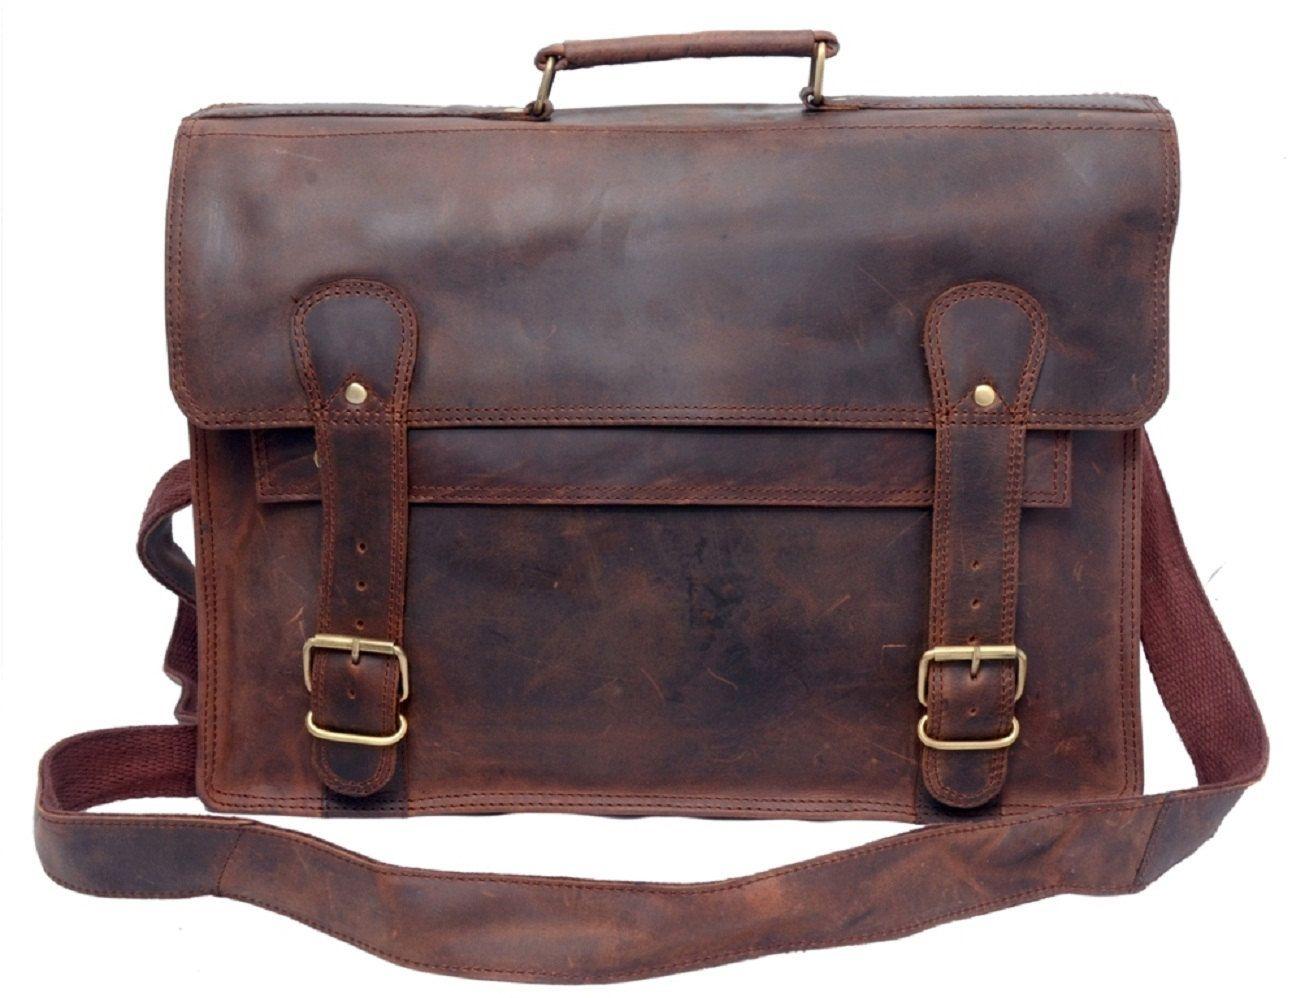 Distressed Leather Messenger Bag Men Briefcase Office Laptop Satchel Macbook 94 00 Usd